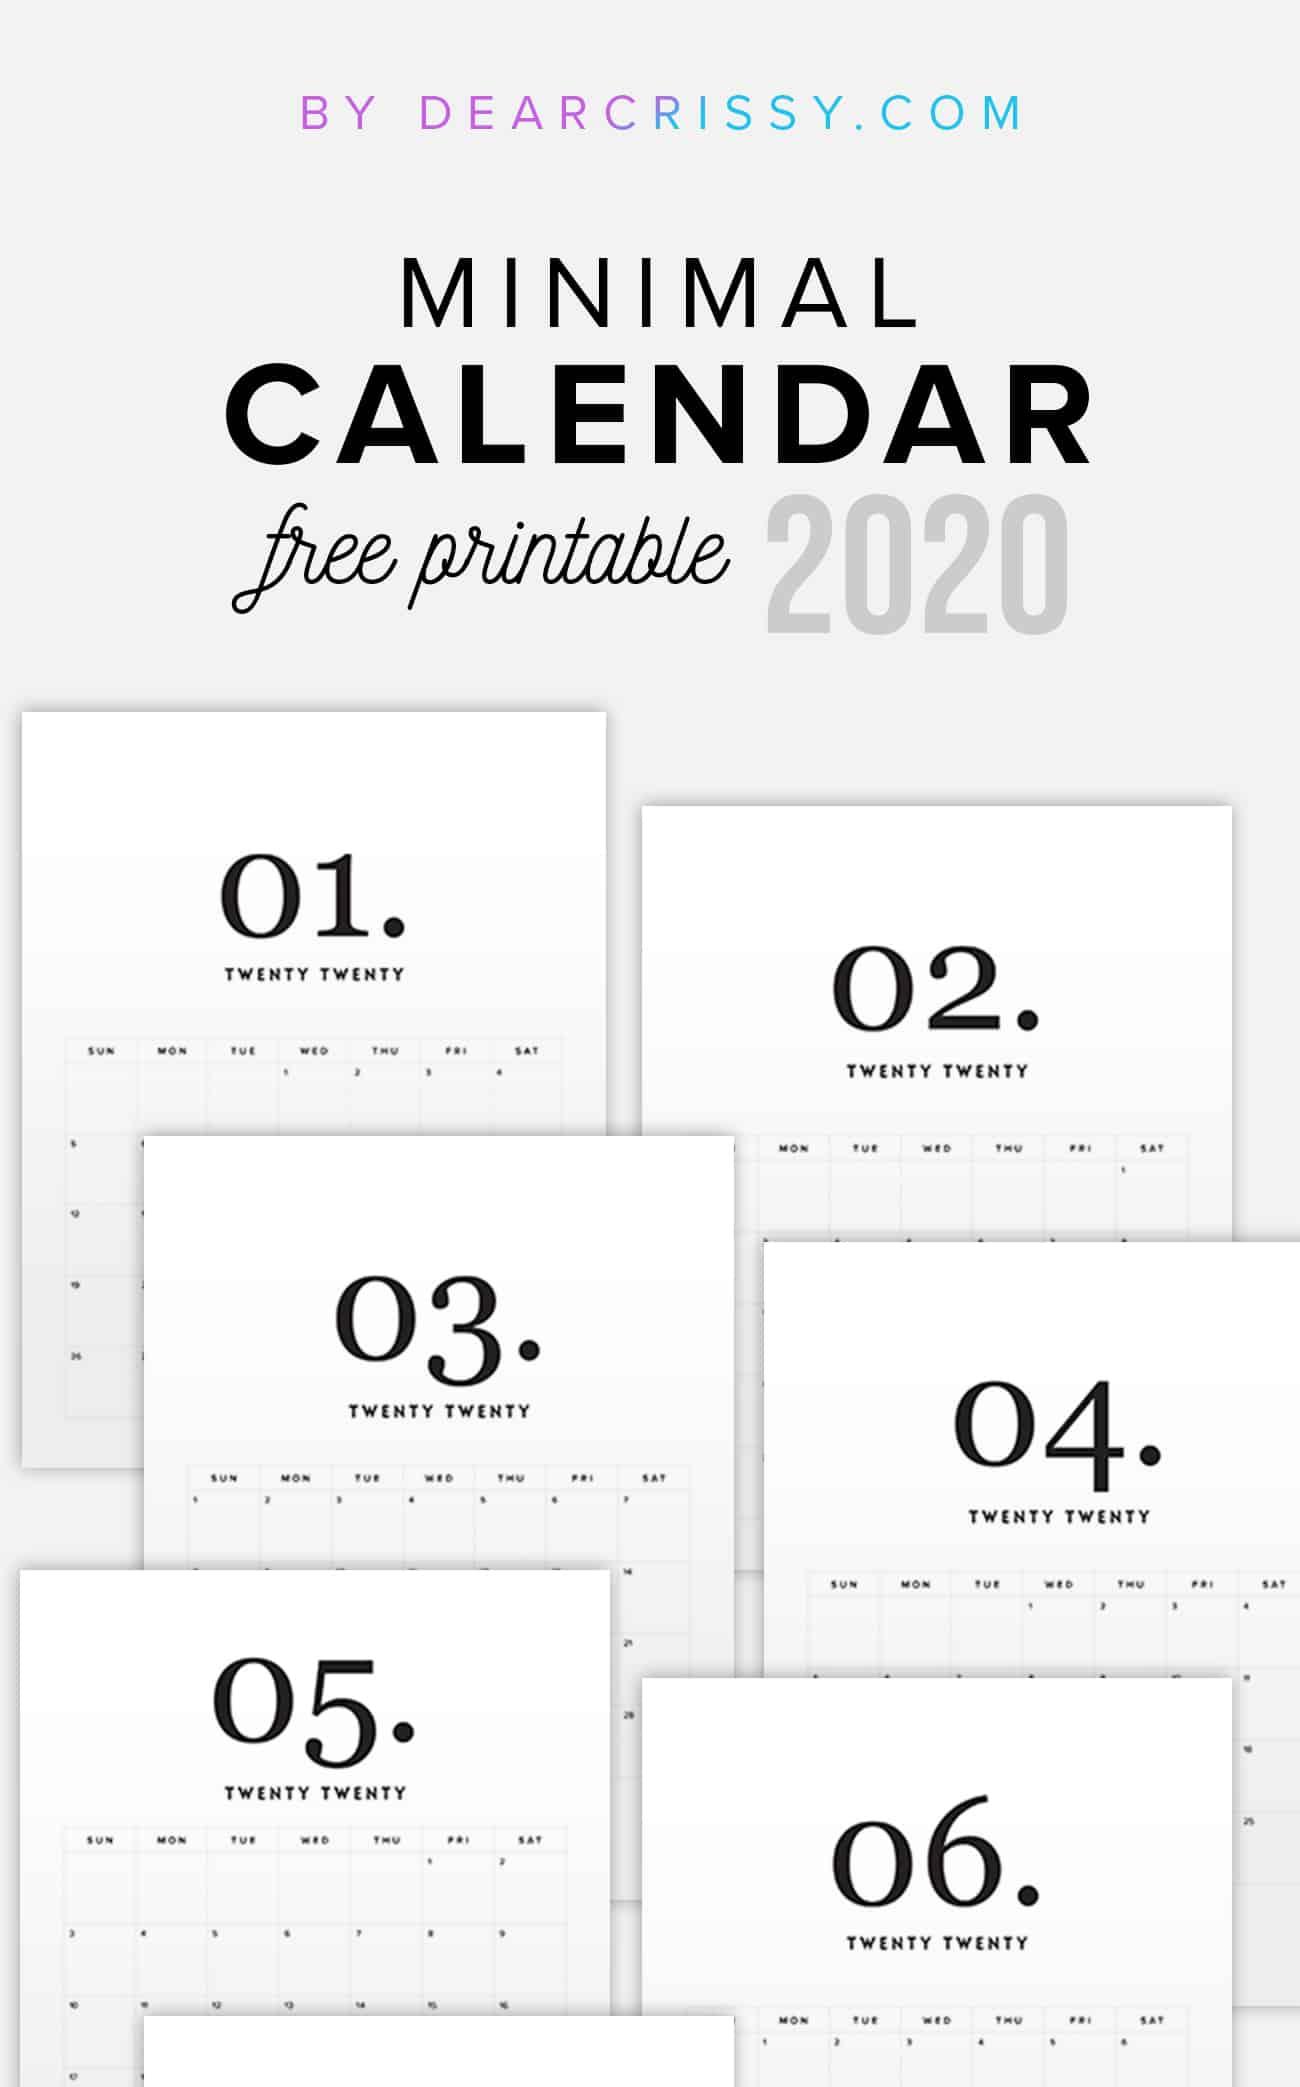 2020 Free Printable Calendar  Minimal Modern Calendar intended for Free Printable Calendar Numbers